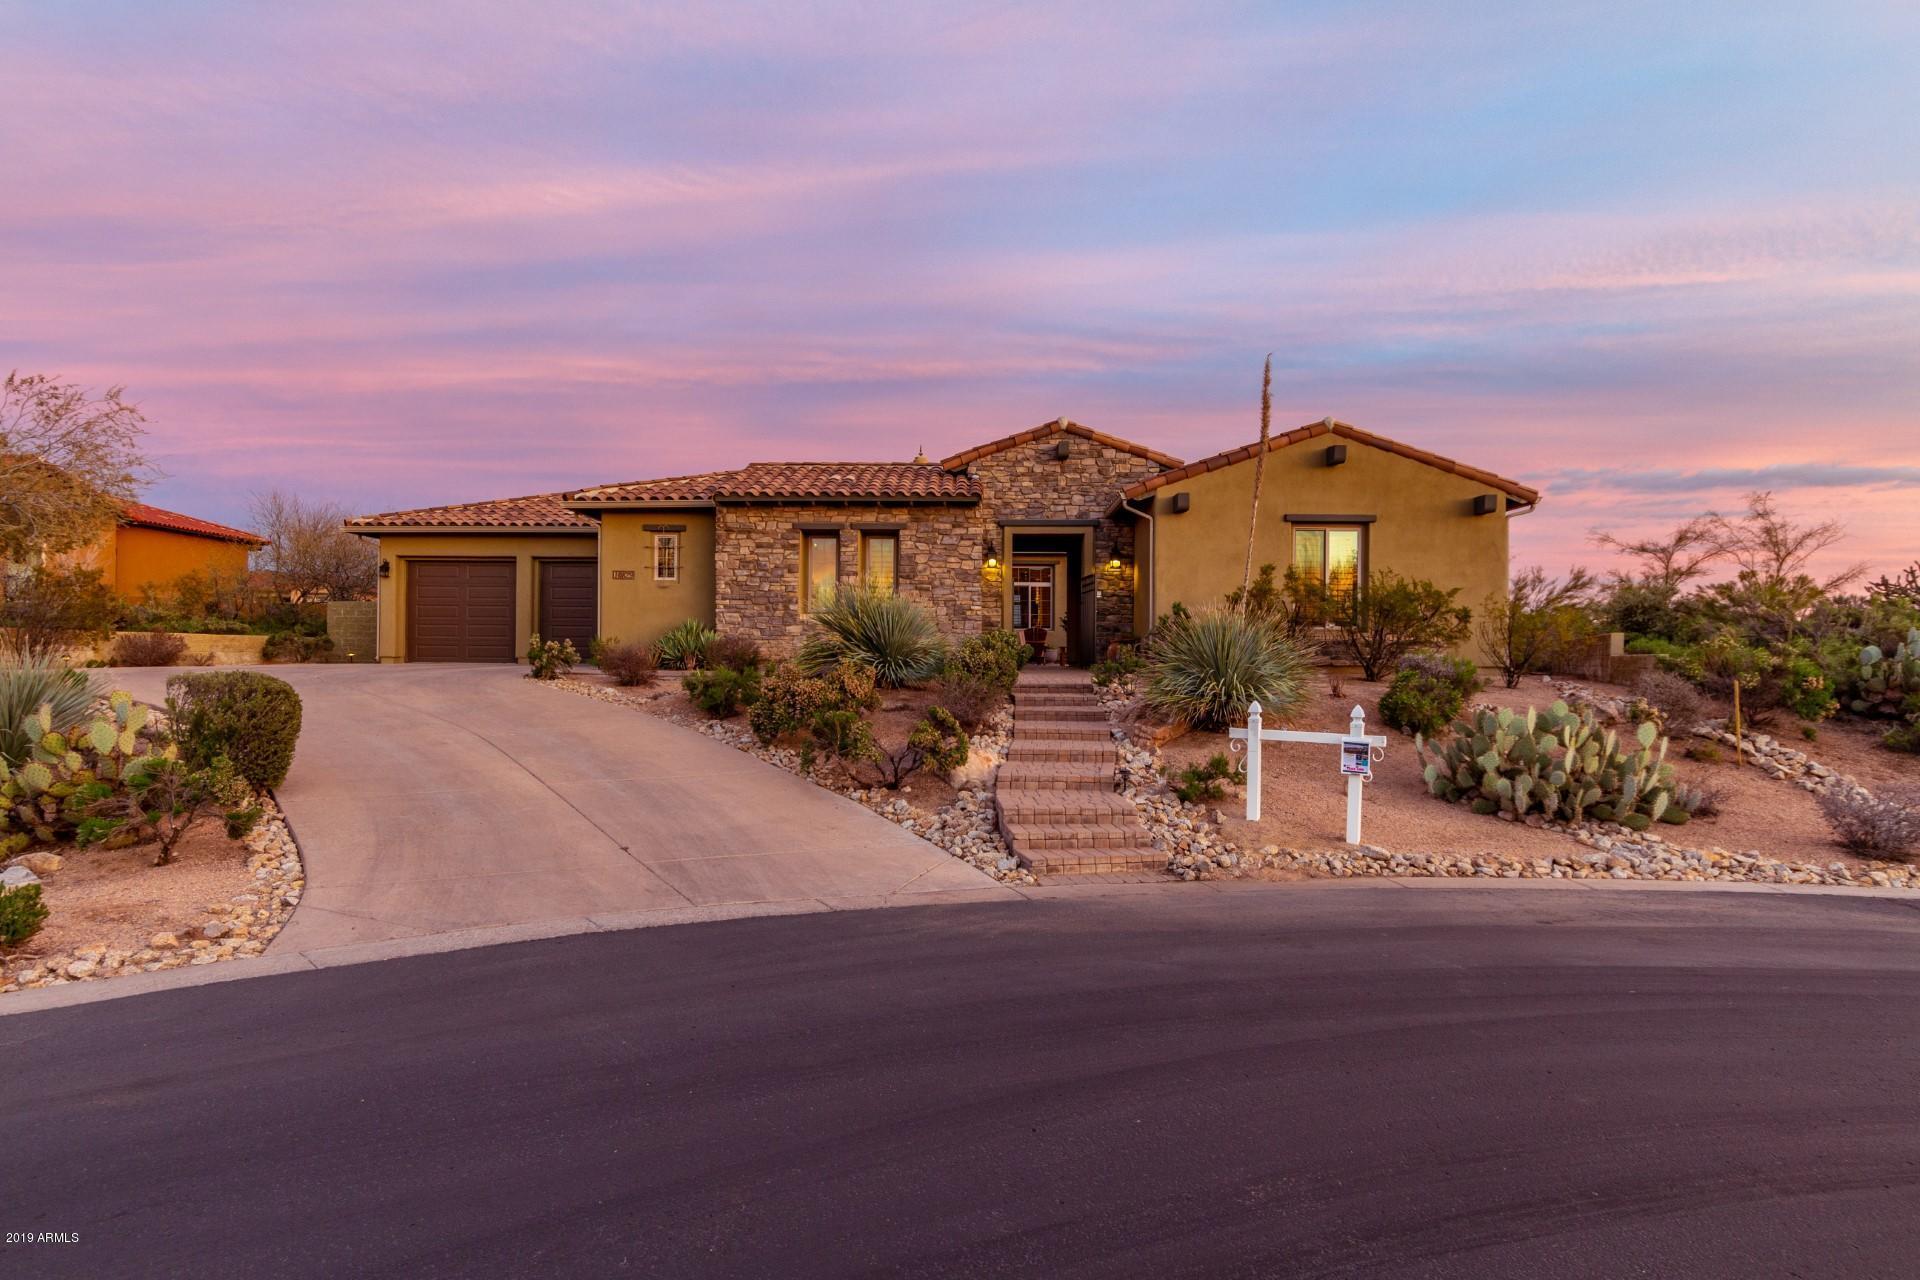 10829 E ADDY Way, Scottsdale AZ 85262